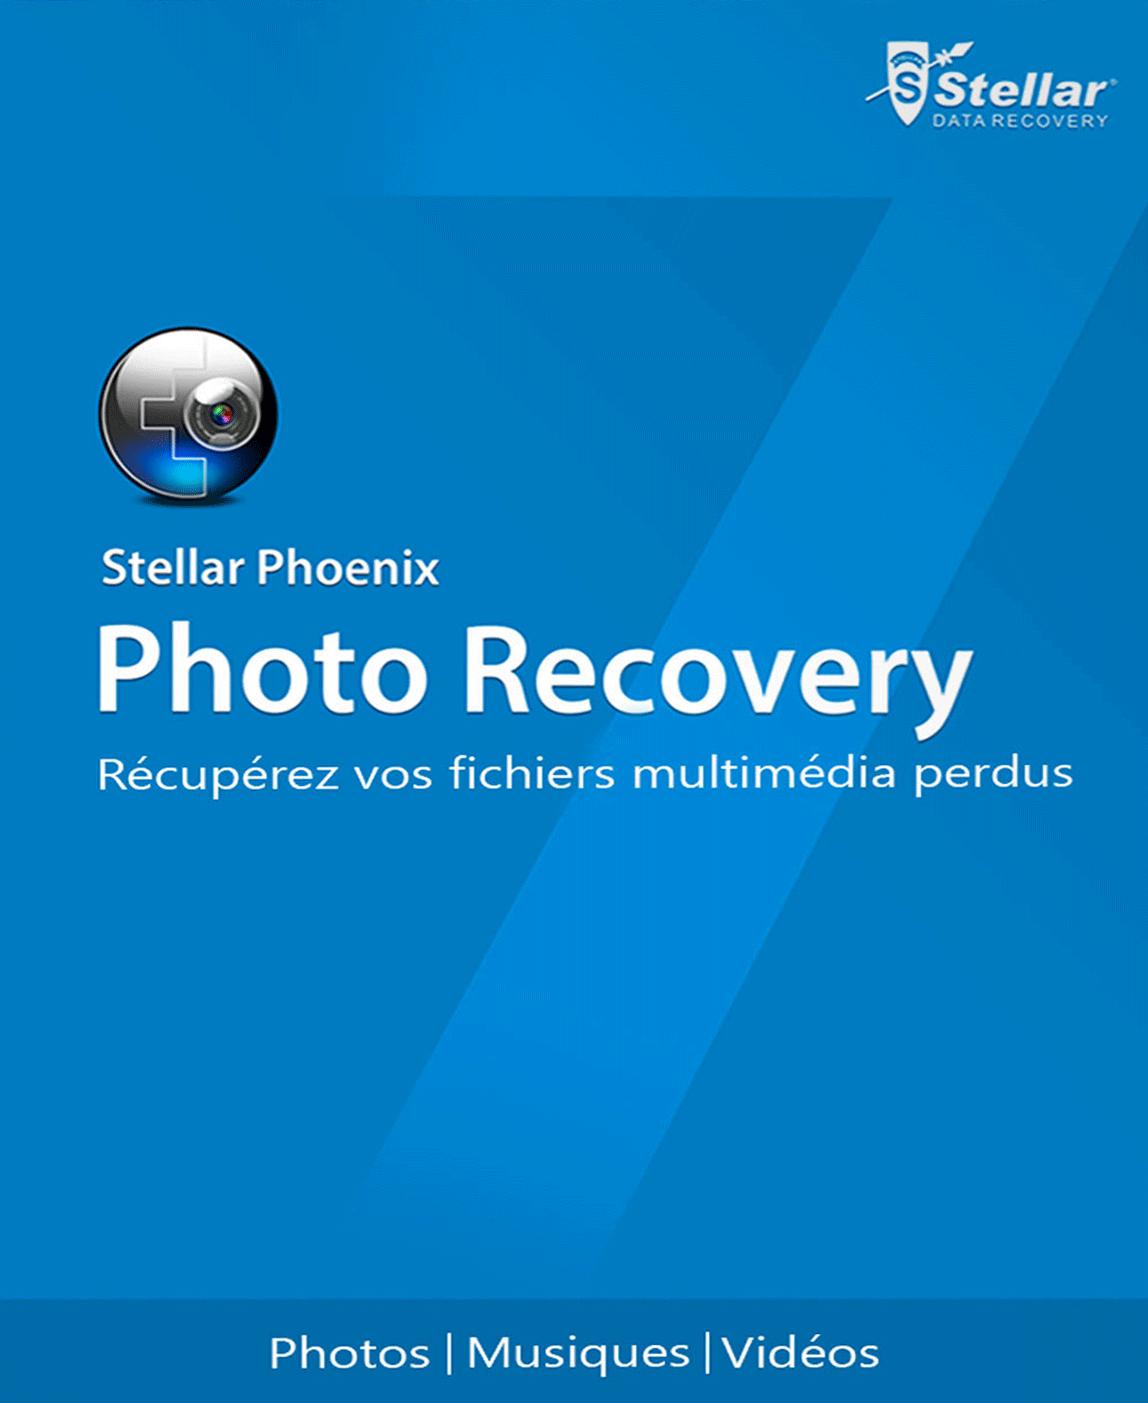 Stellar Phoenix Photo Recovery 7 [Téléchargement]